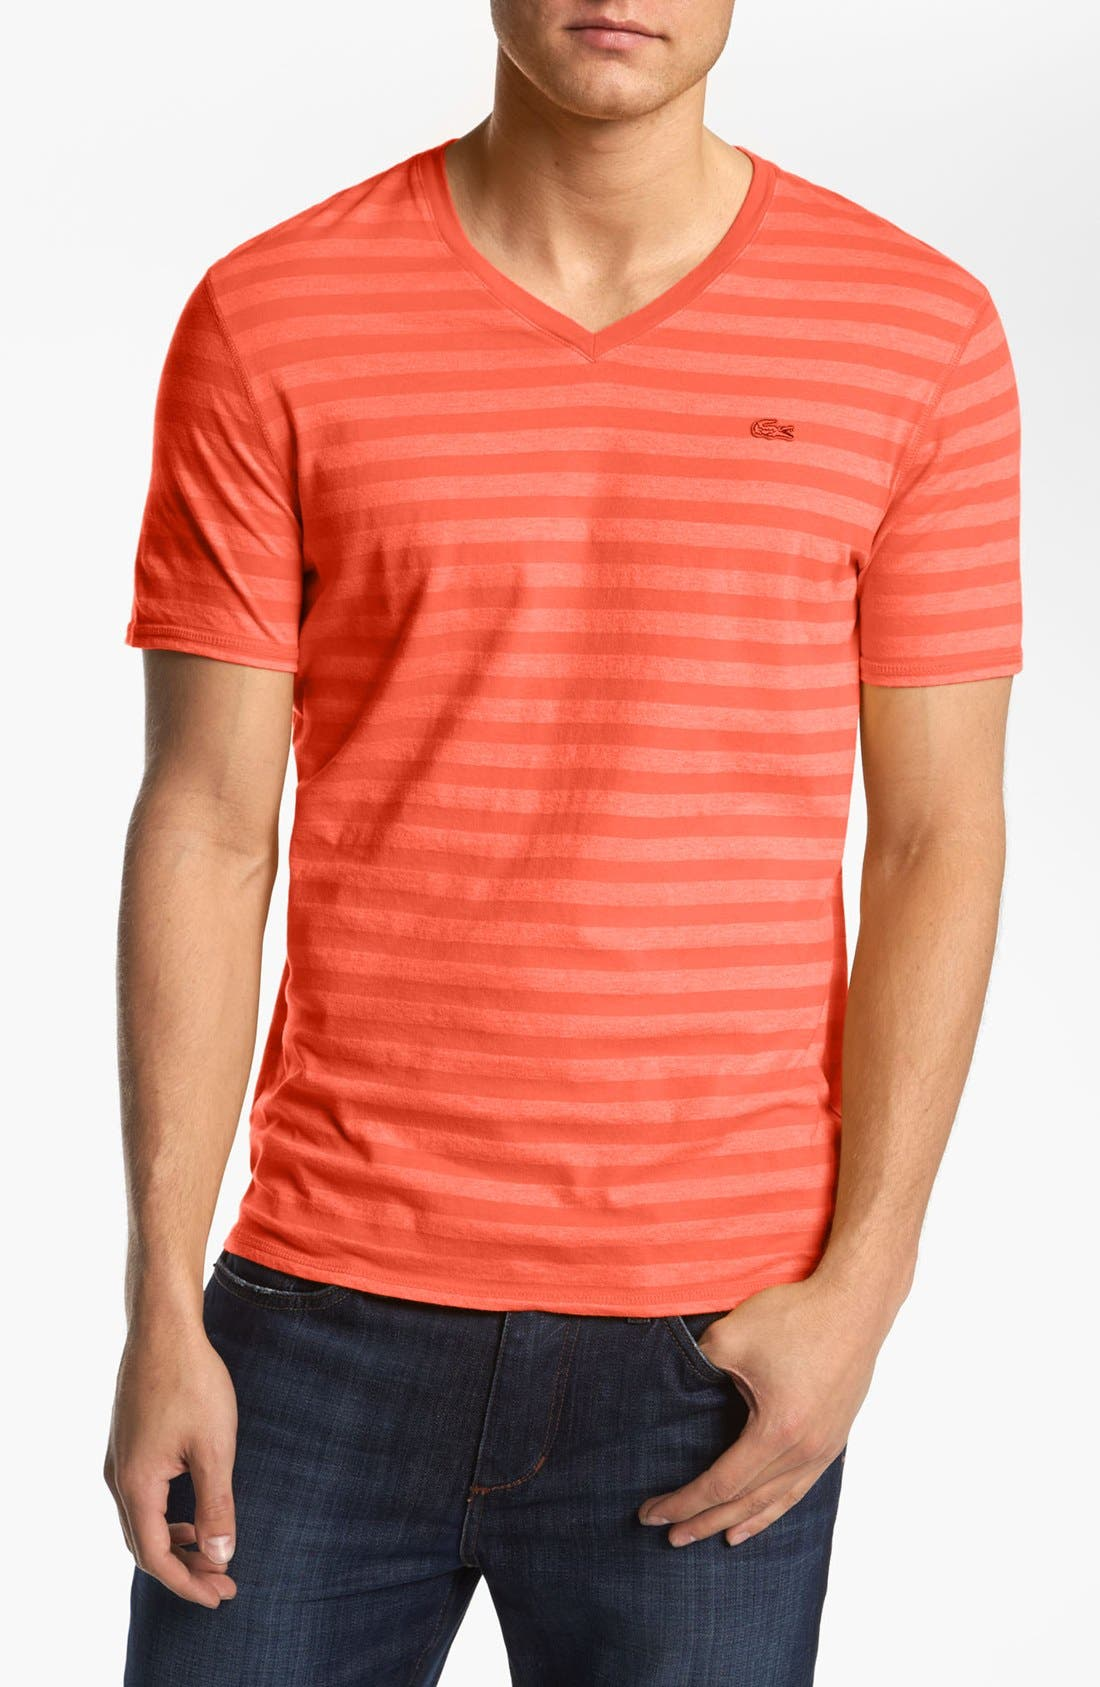 Alternate Image 1 Selected - Lacoste Stripe V-Neck T-Shirt